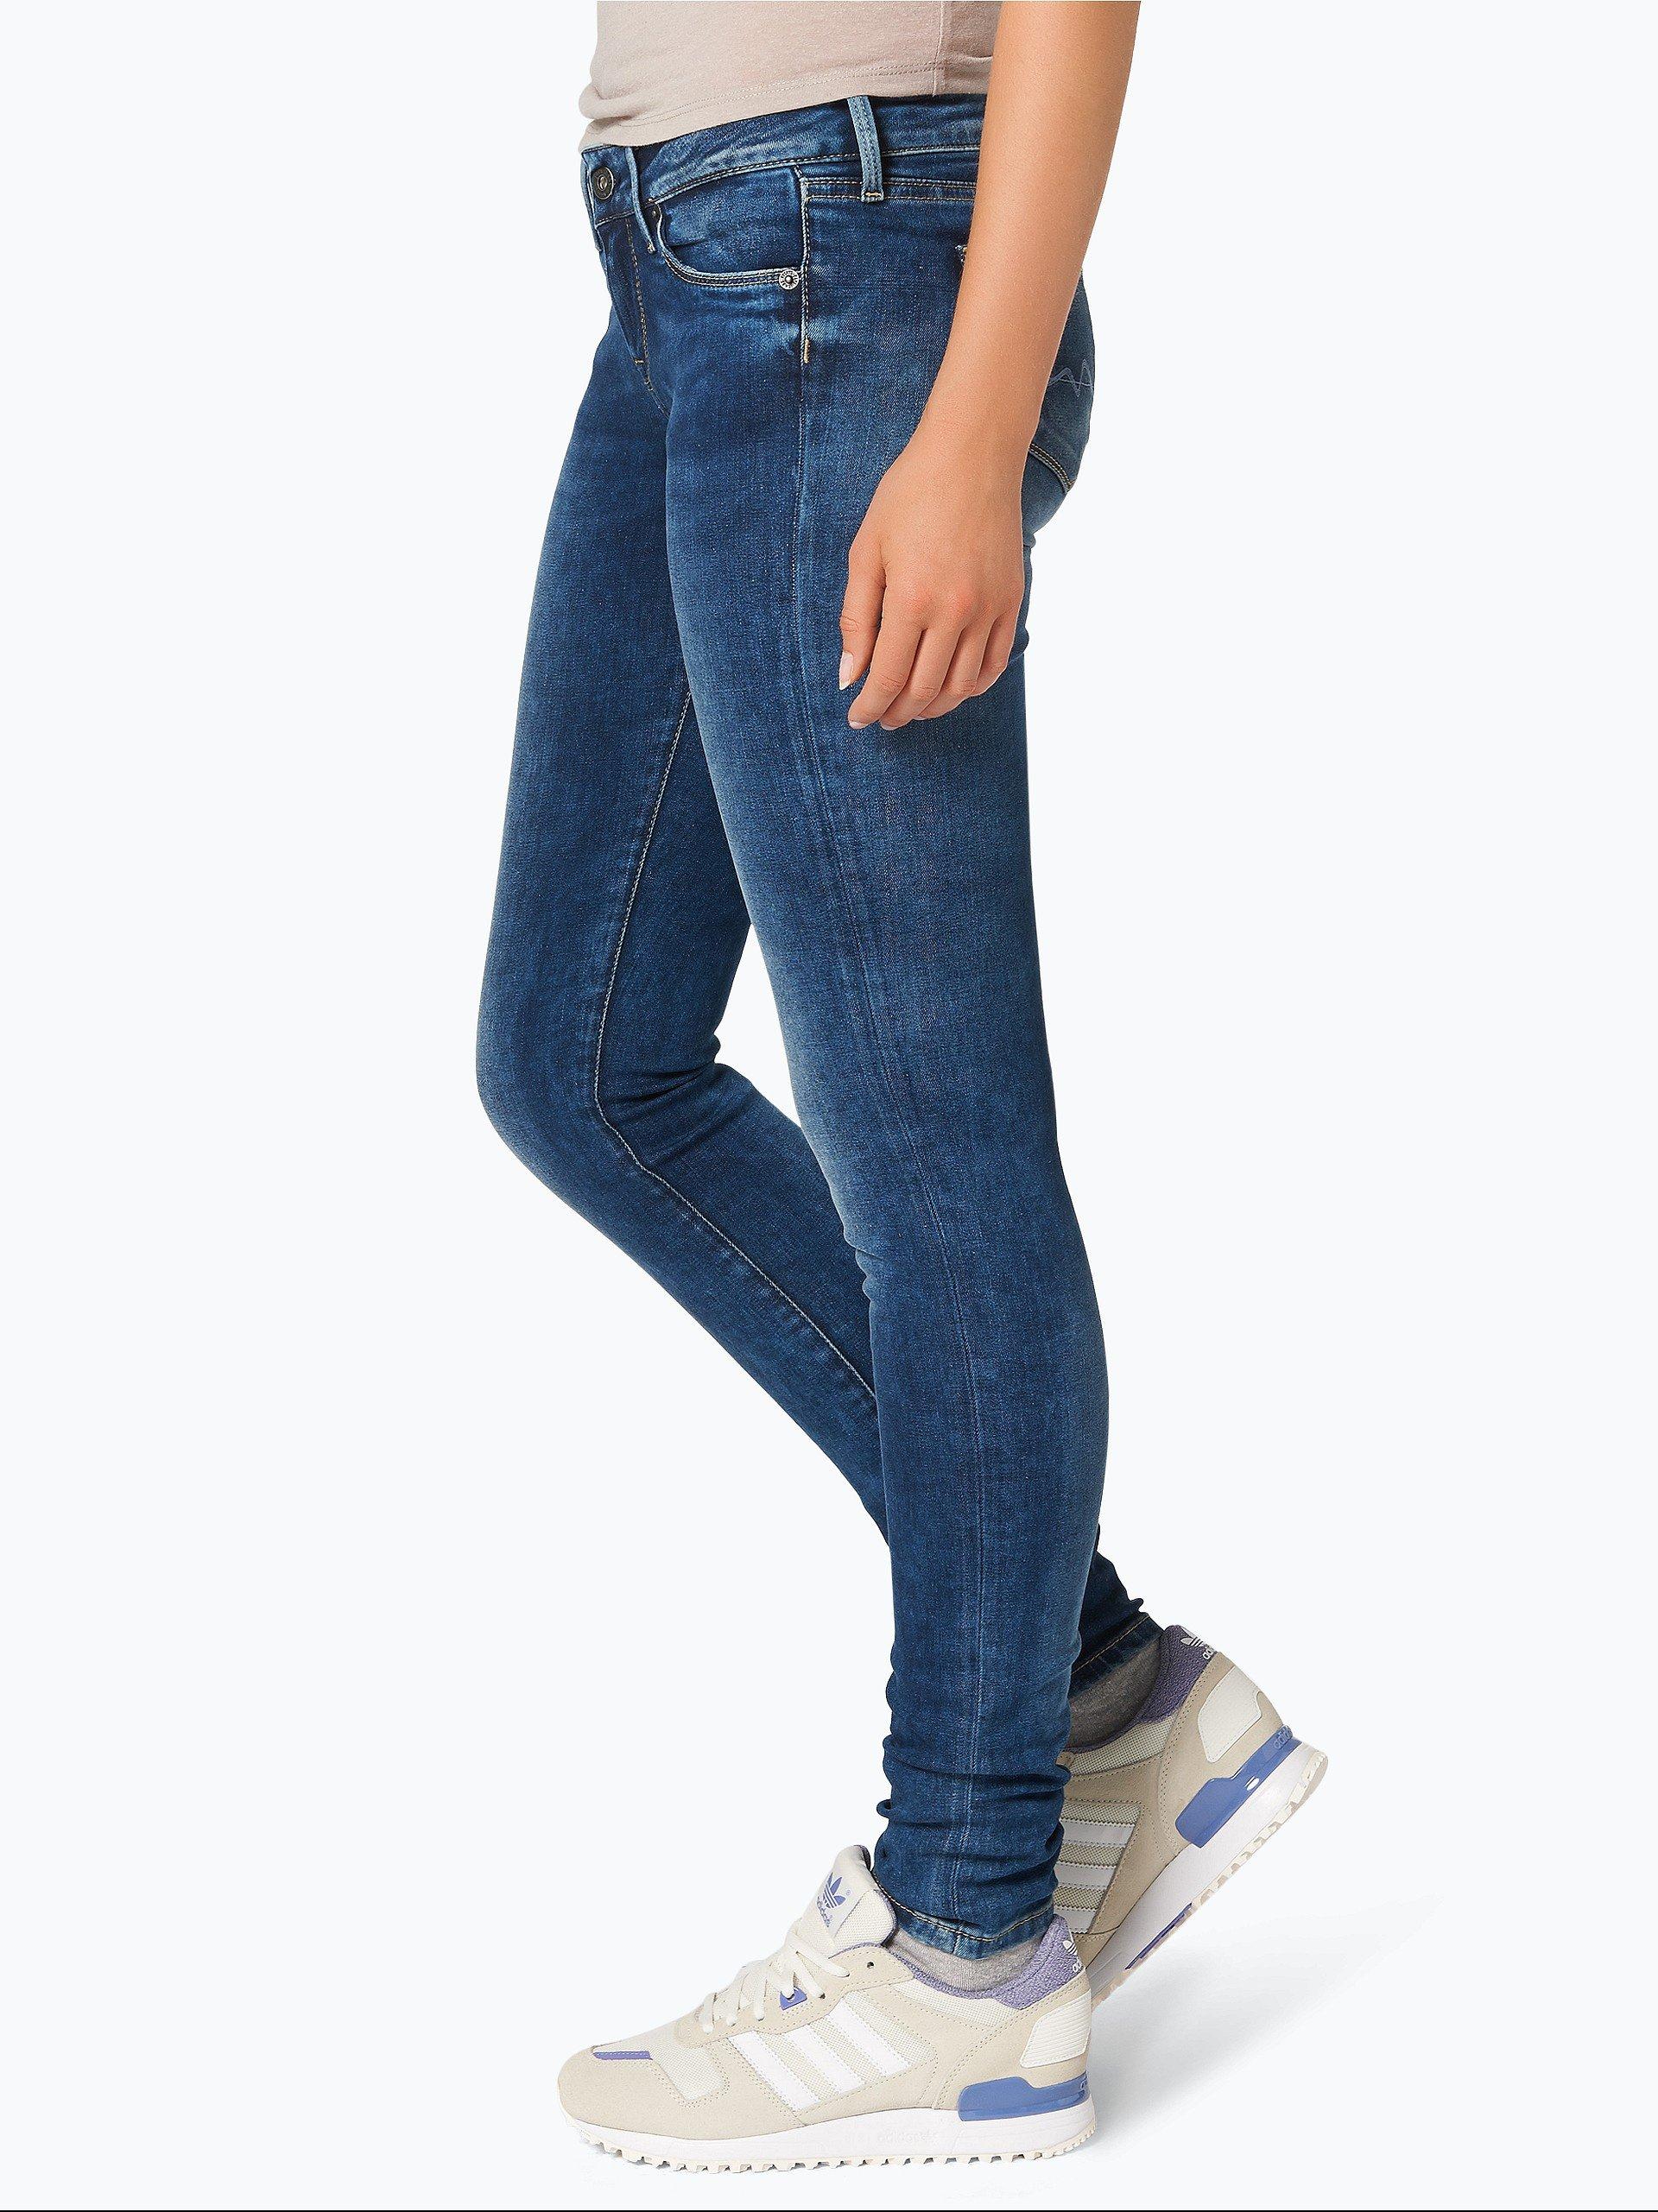 pepe jeans damen jeans soho 2 online kaufen peek und cloppenburg de. Black Bedroom Furniture Sets. Home Design Ideas